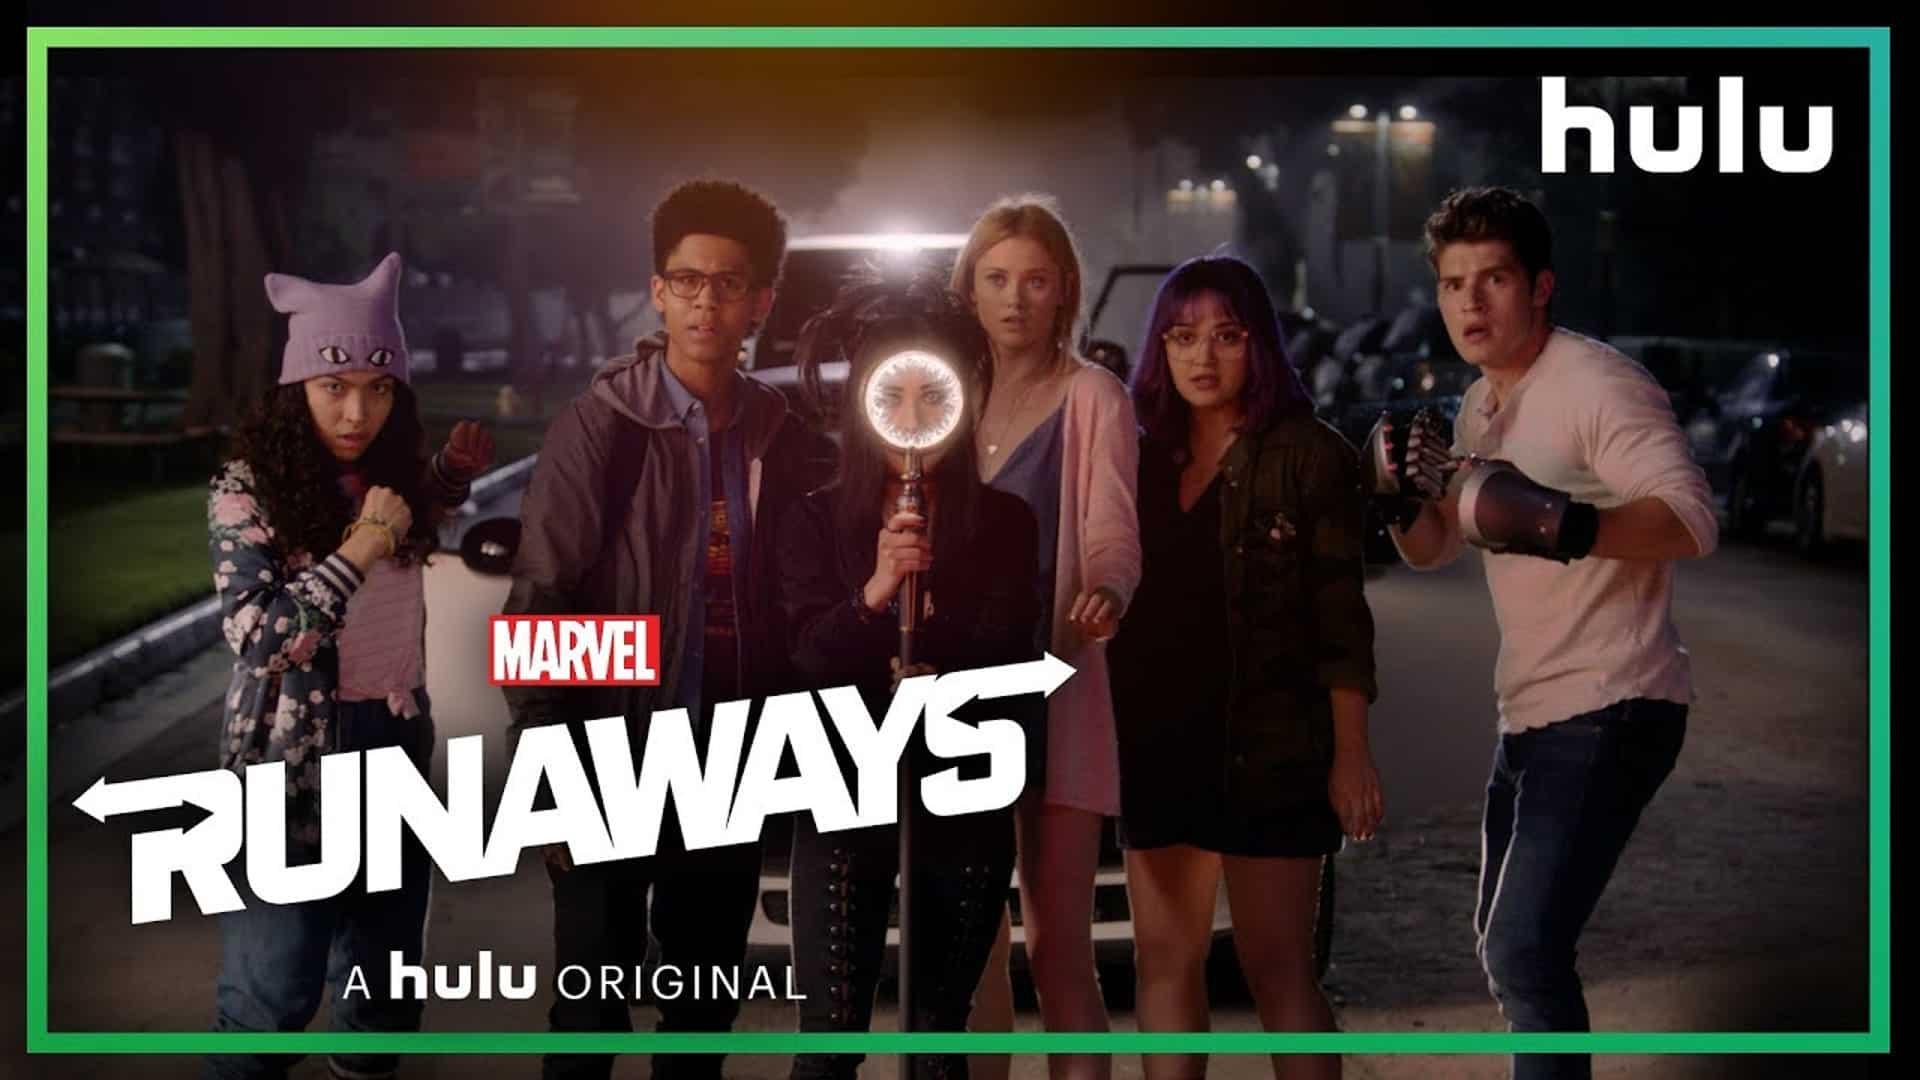 Marvel's Runaways DLC joins The Lego Marvel Superheroes 2 Roster